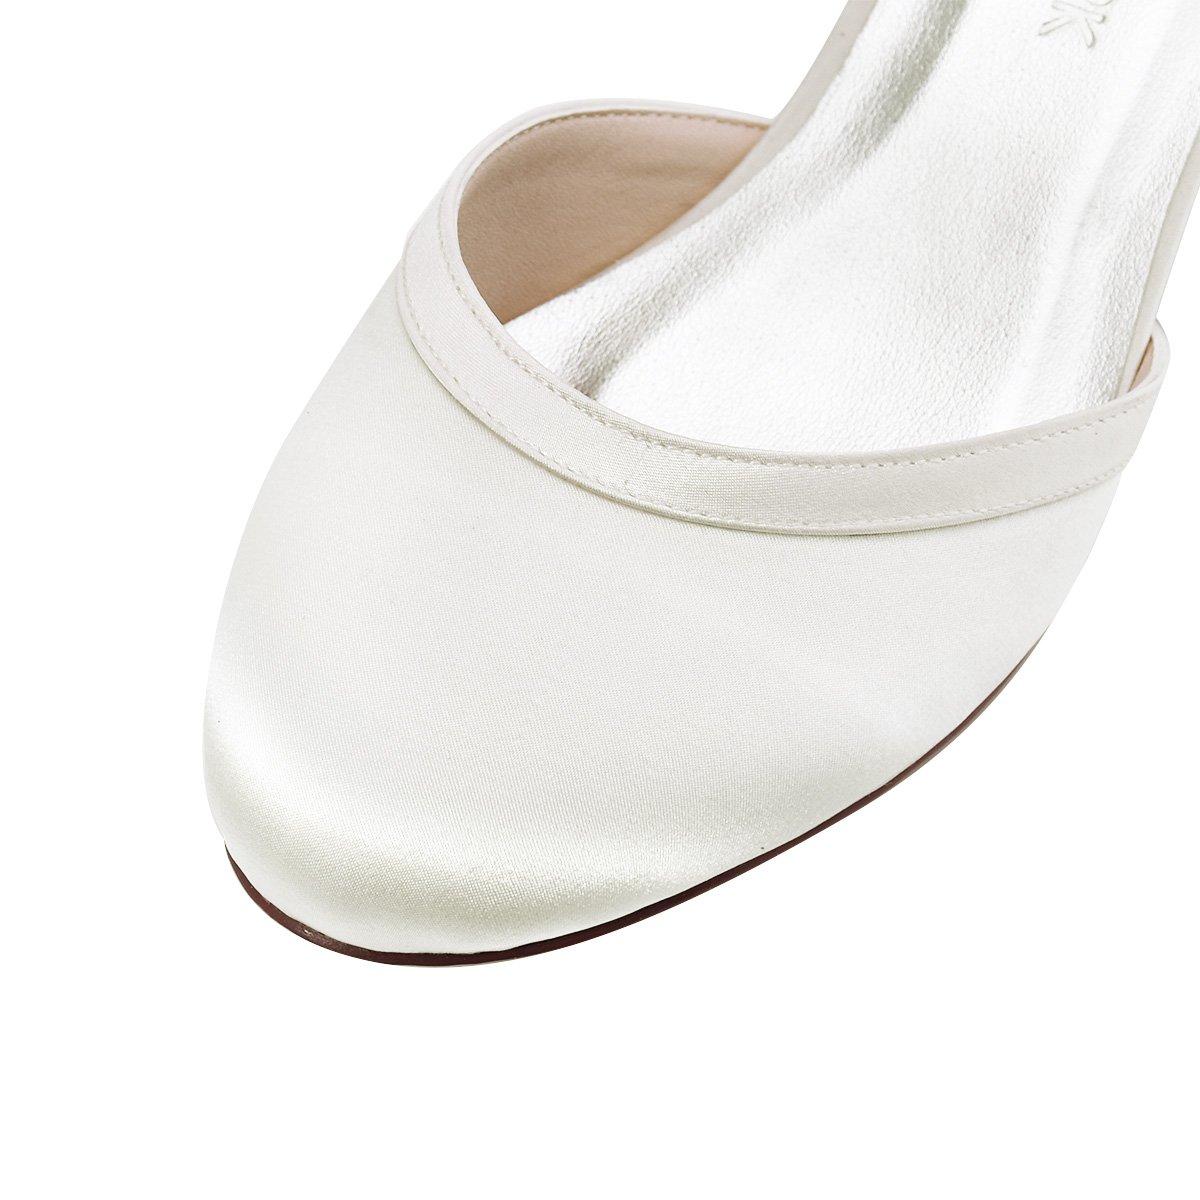 ElegantPark Donna Punta Chiusa Tacco Grosso Cinturino Scarpe Alla Caviglia Pompe Satin Scarpe Cinturino Da Sposa Da Sera  Avorio 54845d